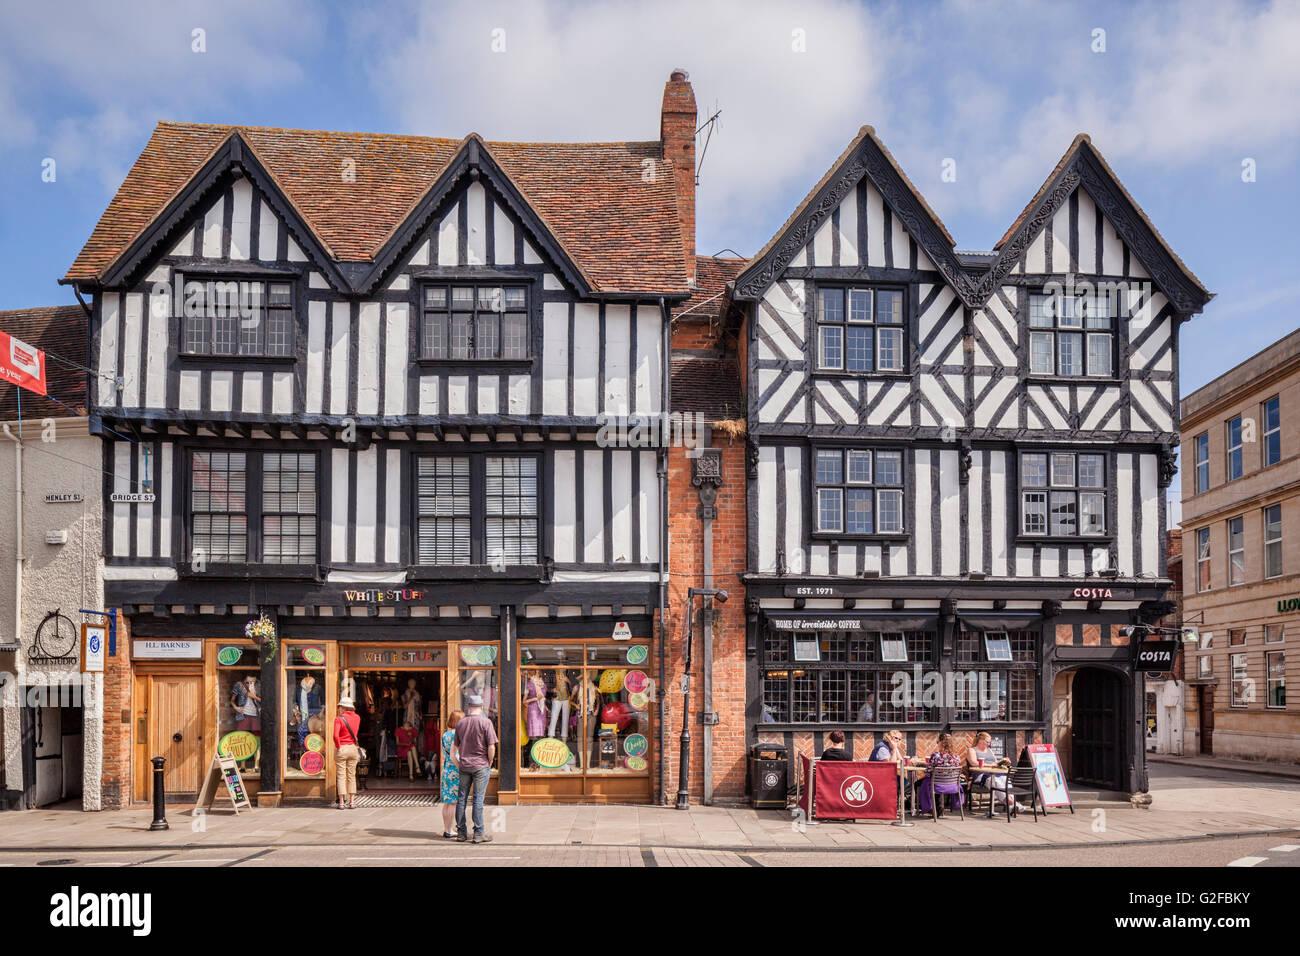 Shops in half-timbered buildings in Bridge Street, Stratford-upon-Avon, Warwickshire, England, UK - Stock Image